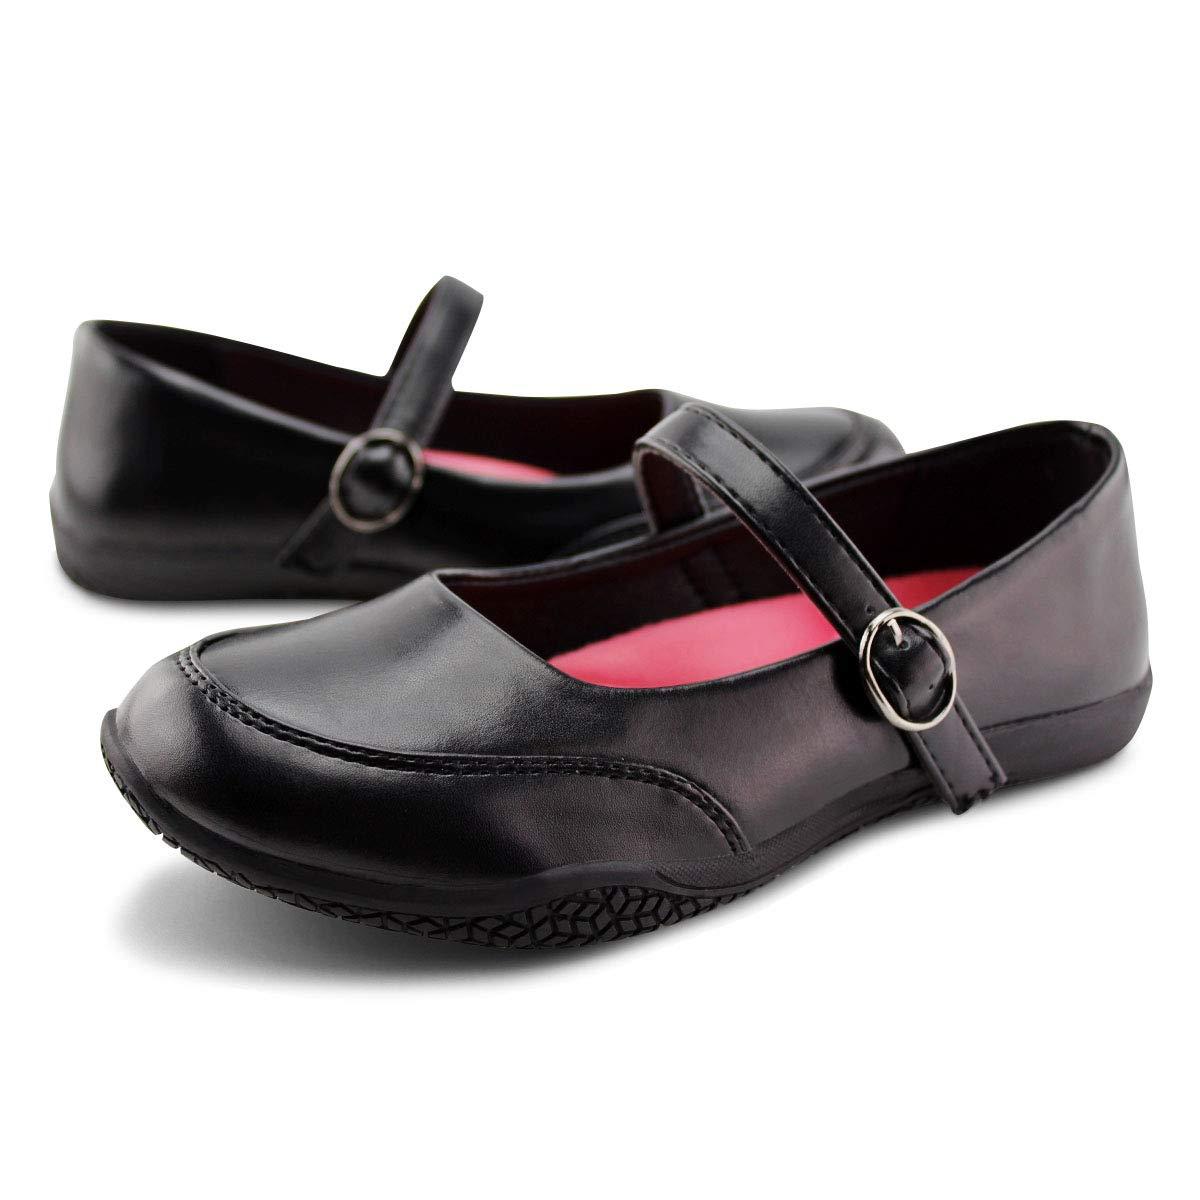 Shoes Classic Uniform Dress Flats